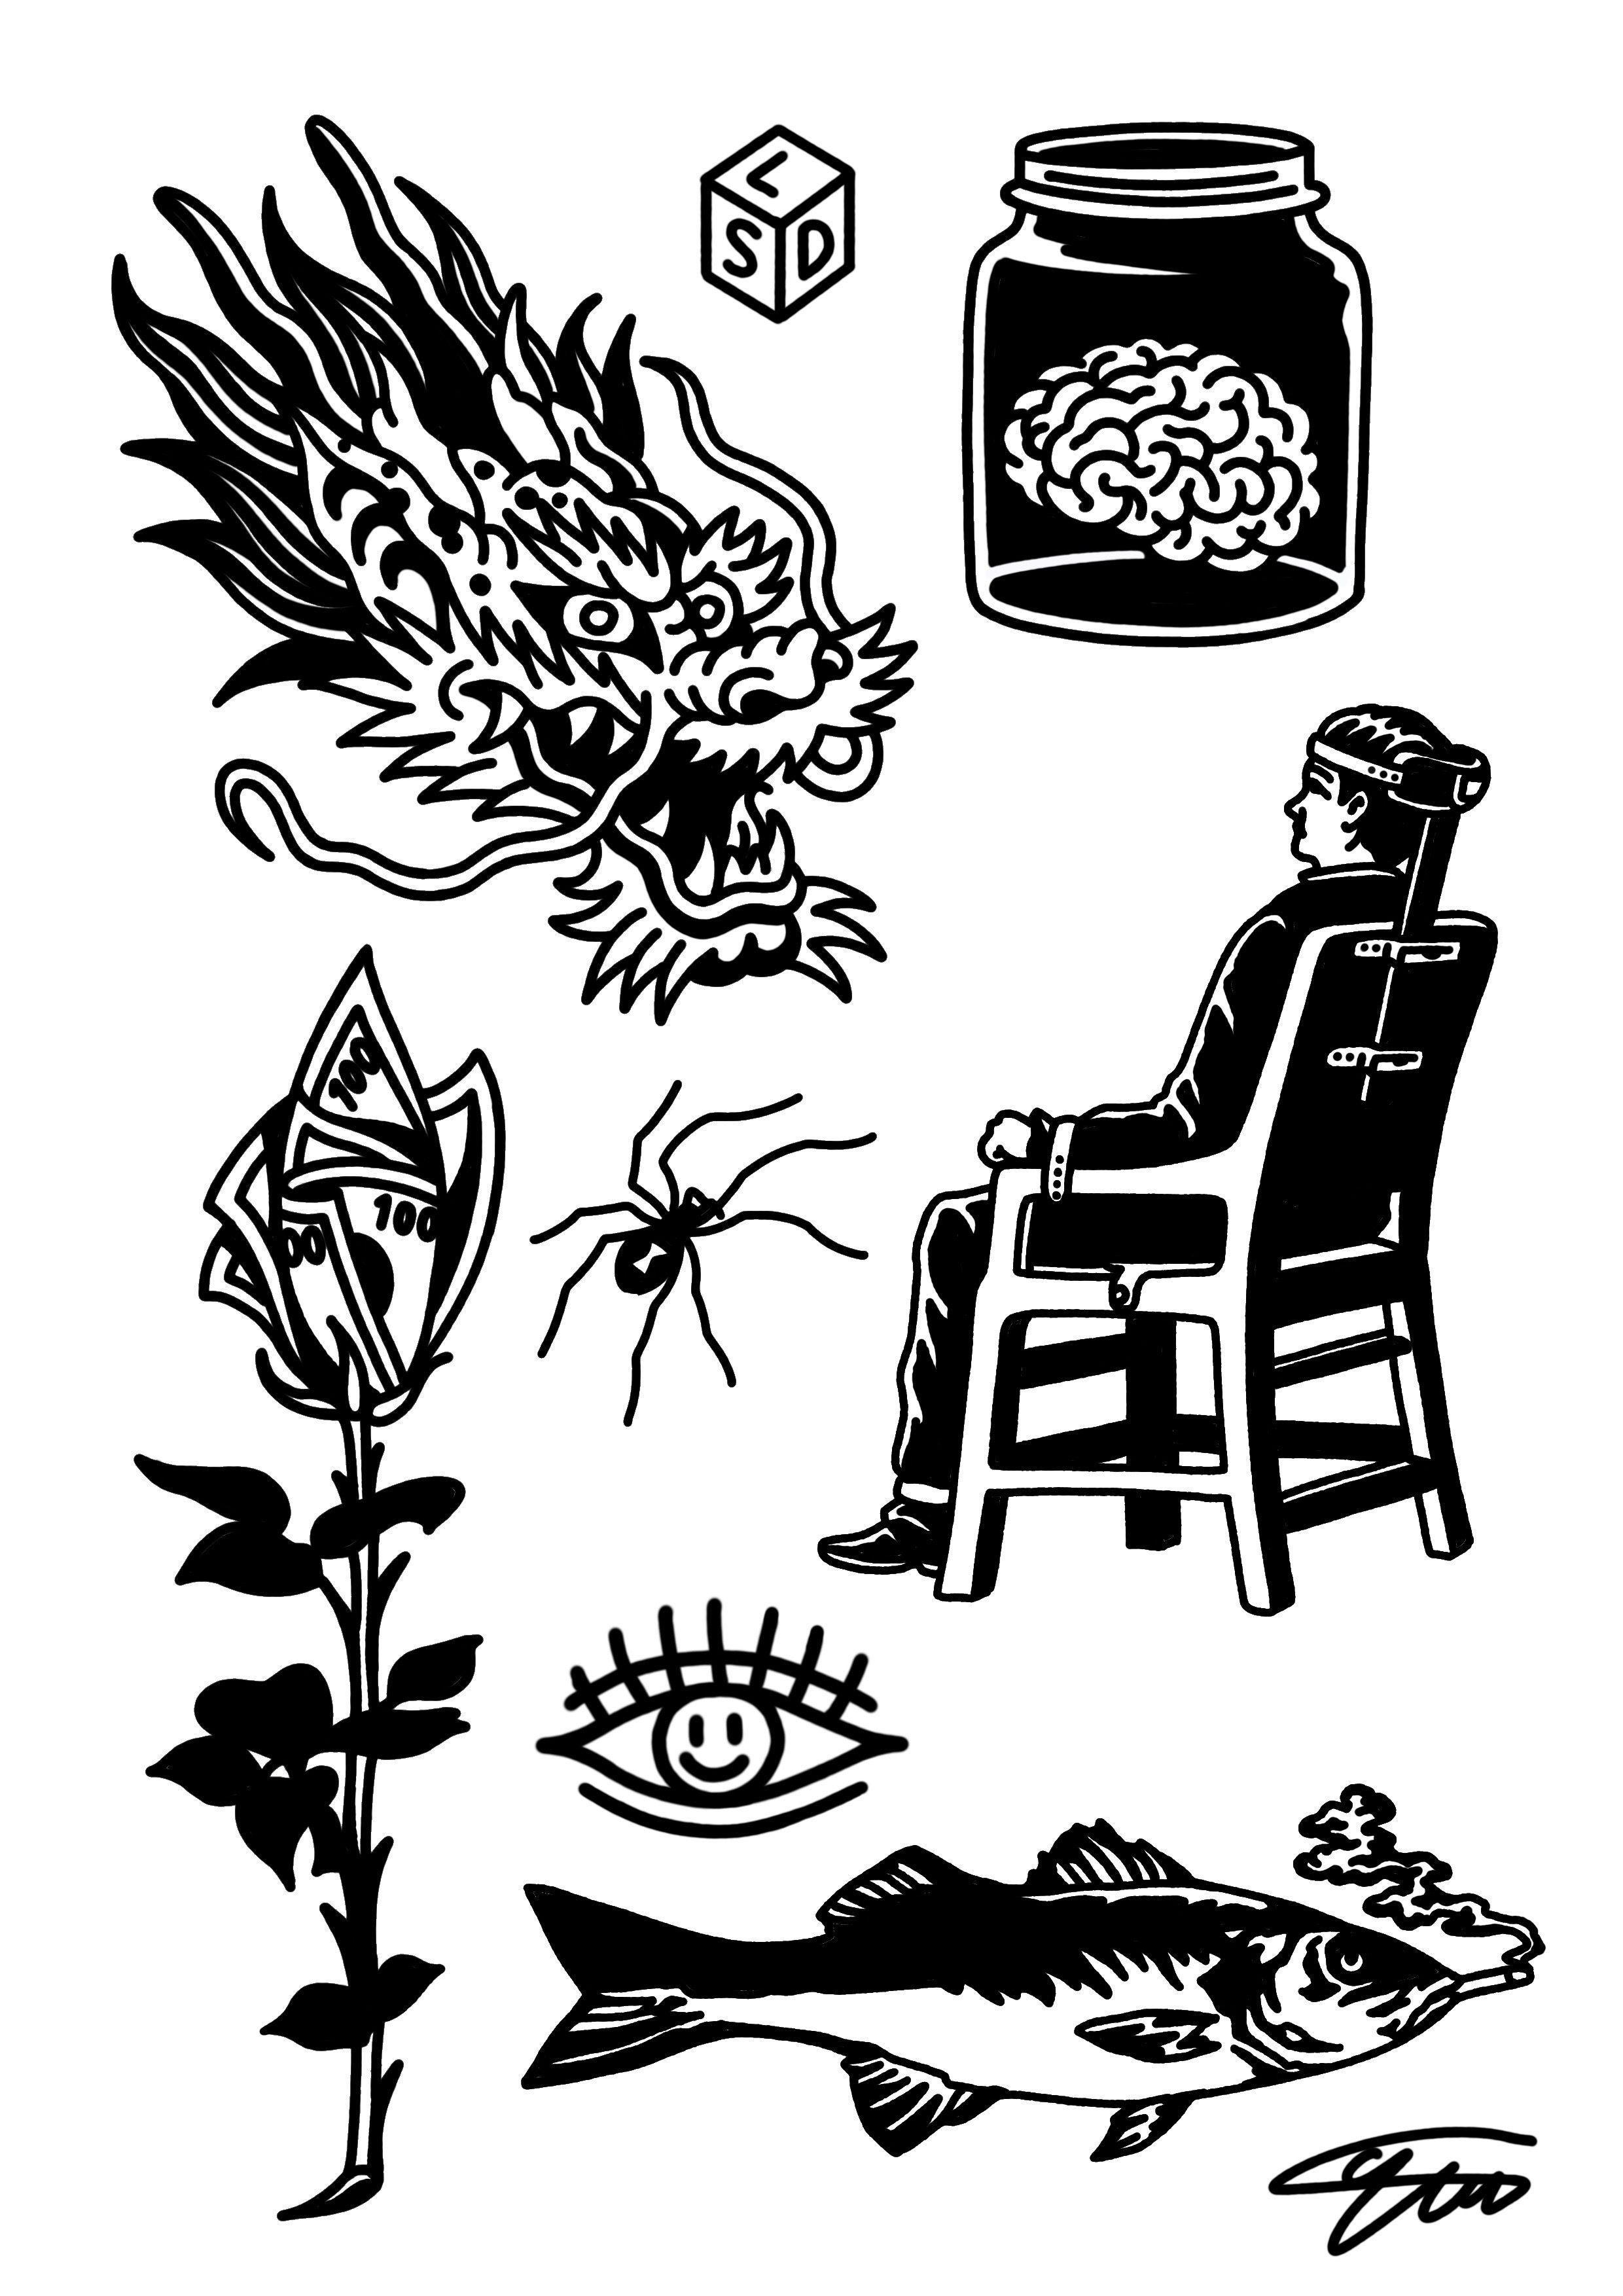 Bocetos De Tatuajes Tradicionales pin de el tincho en tatoo | tatuajes raros, bocetos tatuajes